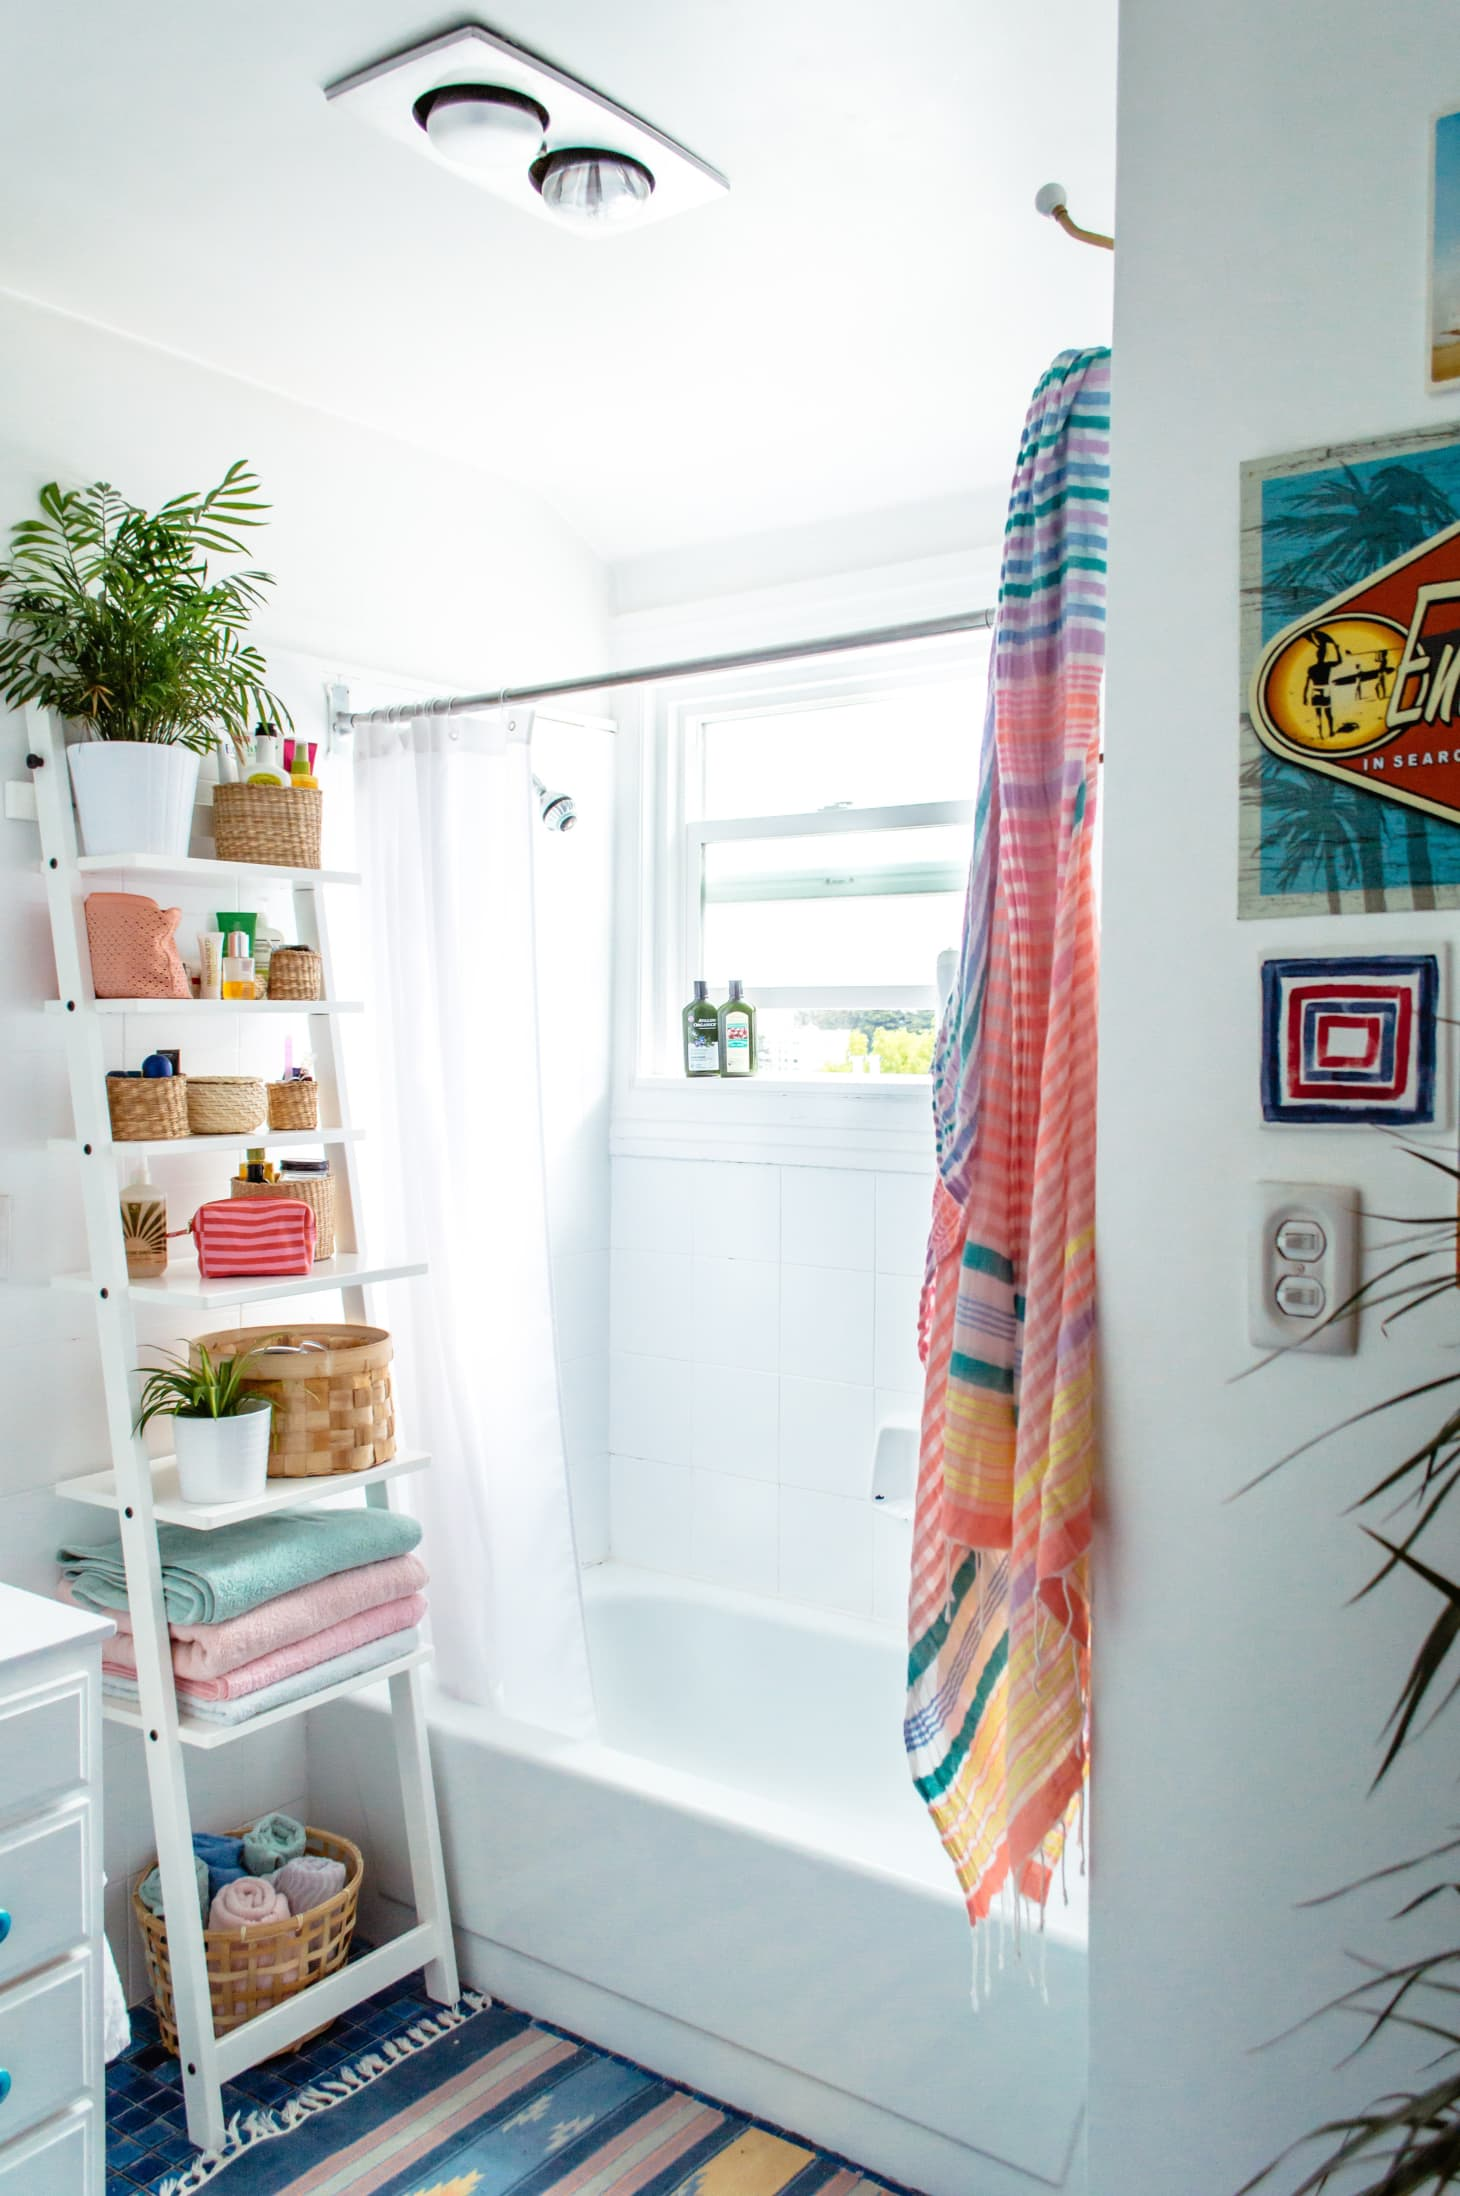 25 Small Bathroom Storage & Design Ideas - Storage ... on Small Apartment Bathroom Storage Ideas  id=62404